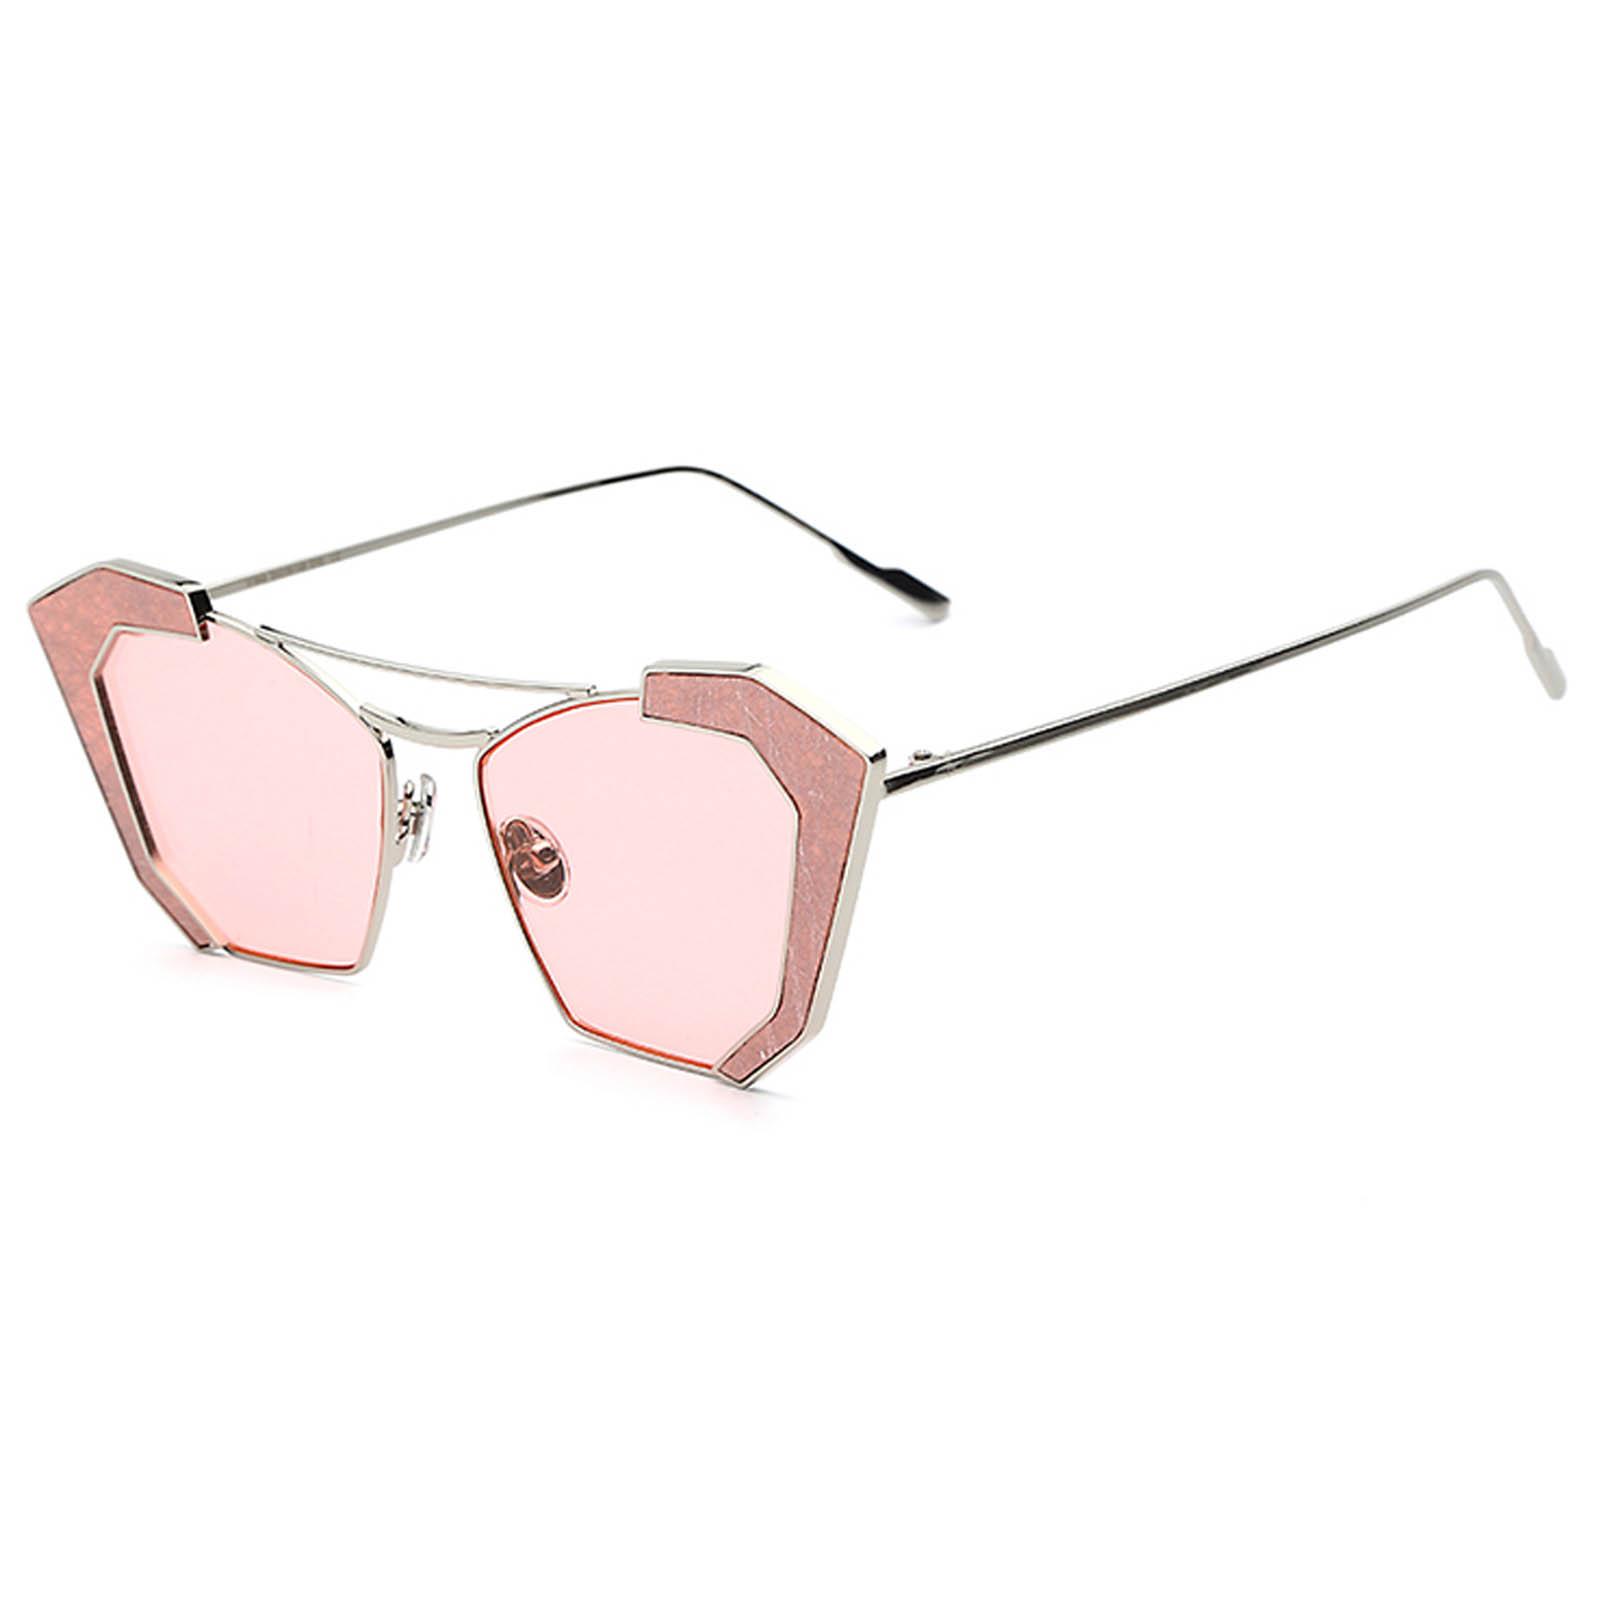 761a3387b3a OWL ® 016 C3 Cat Rectangle Eyewear Sunglasses Women s Men s Metal Silver  Frame Pink Lens One